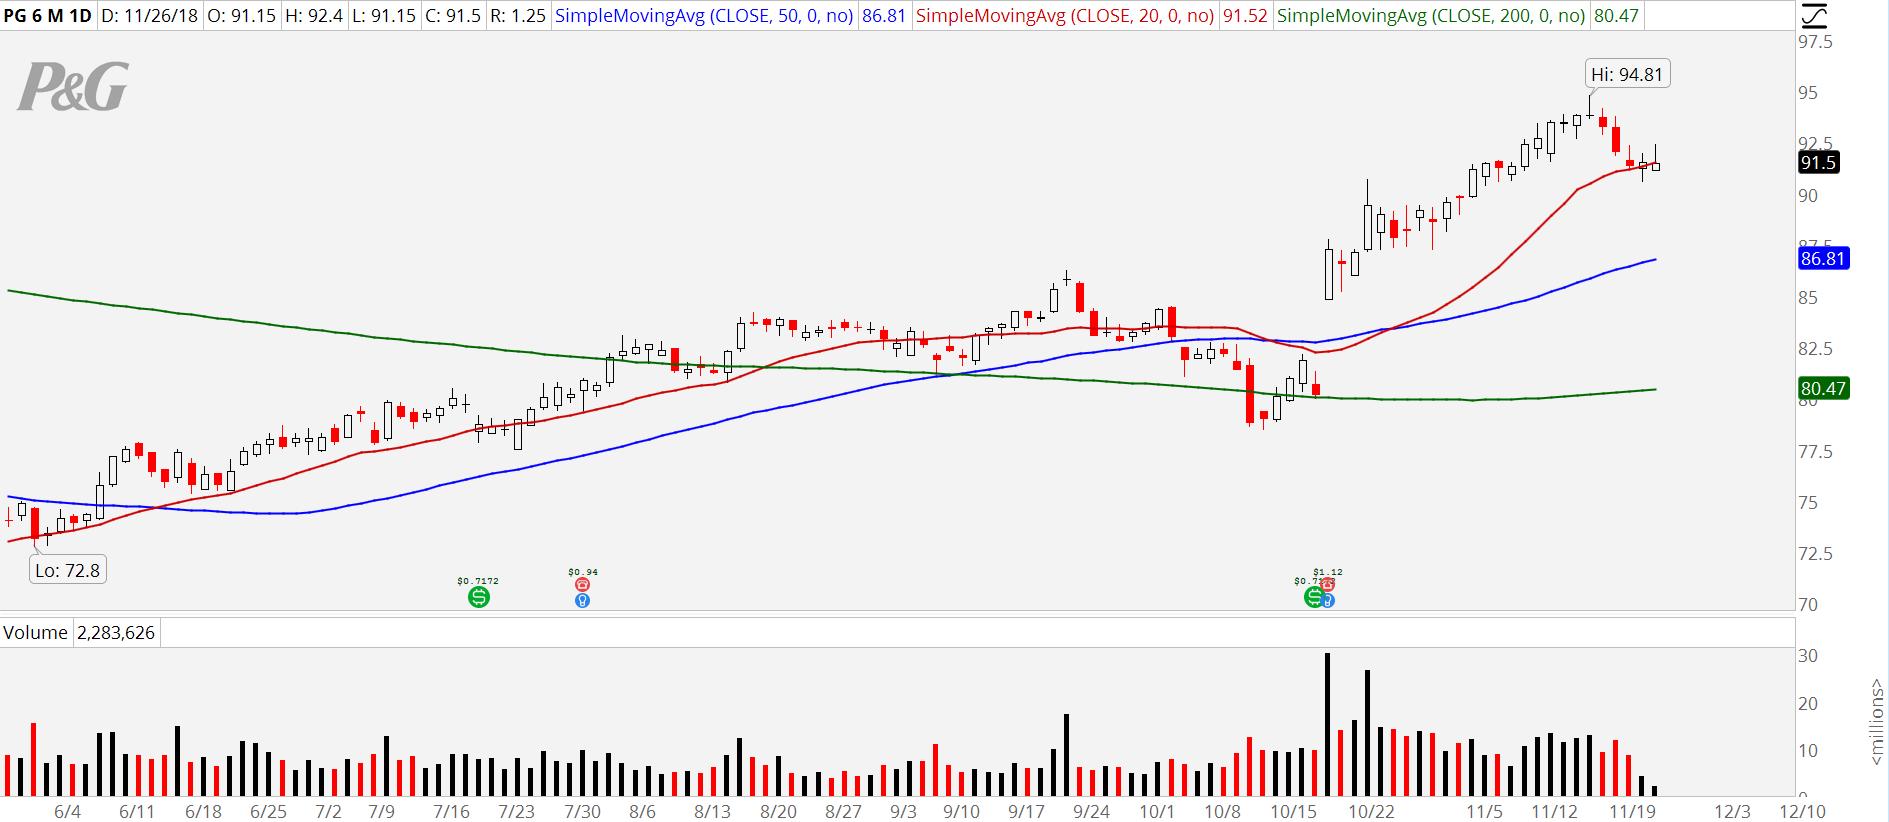 3 Consumer Staples Stocks to Buy: Proctor & Gamble (PG)